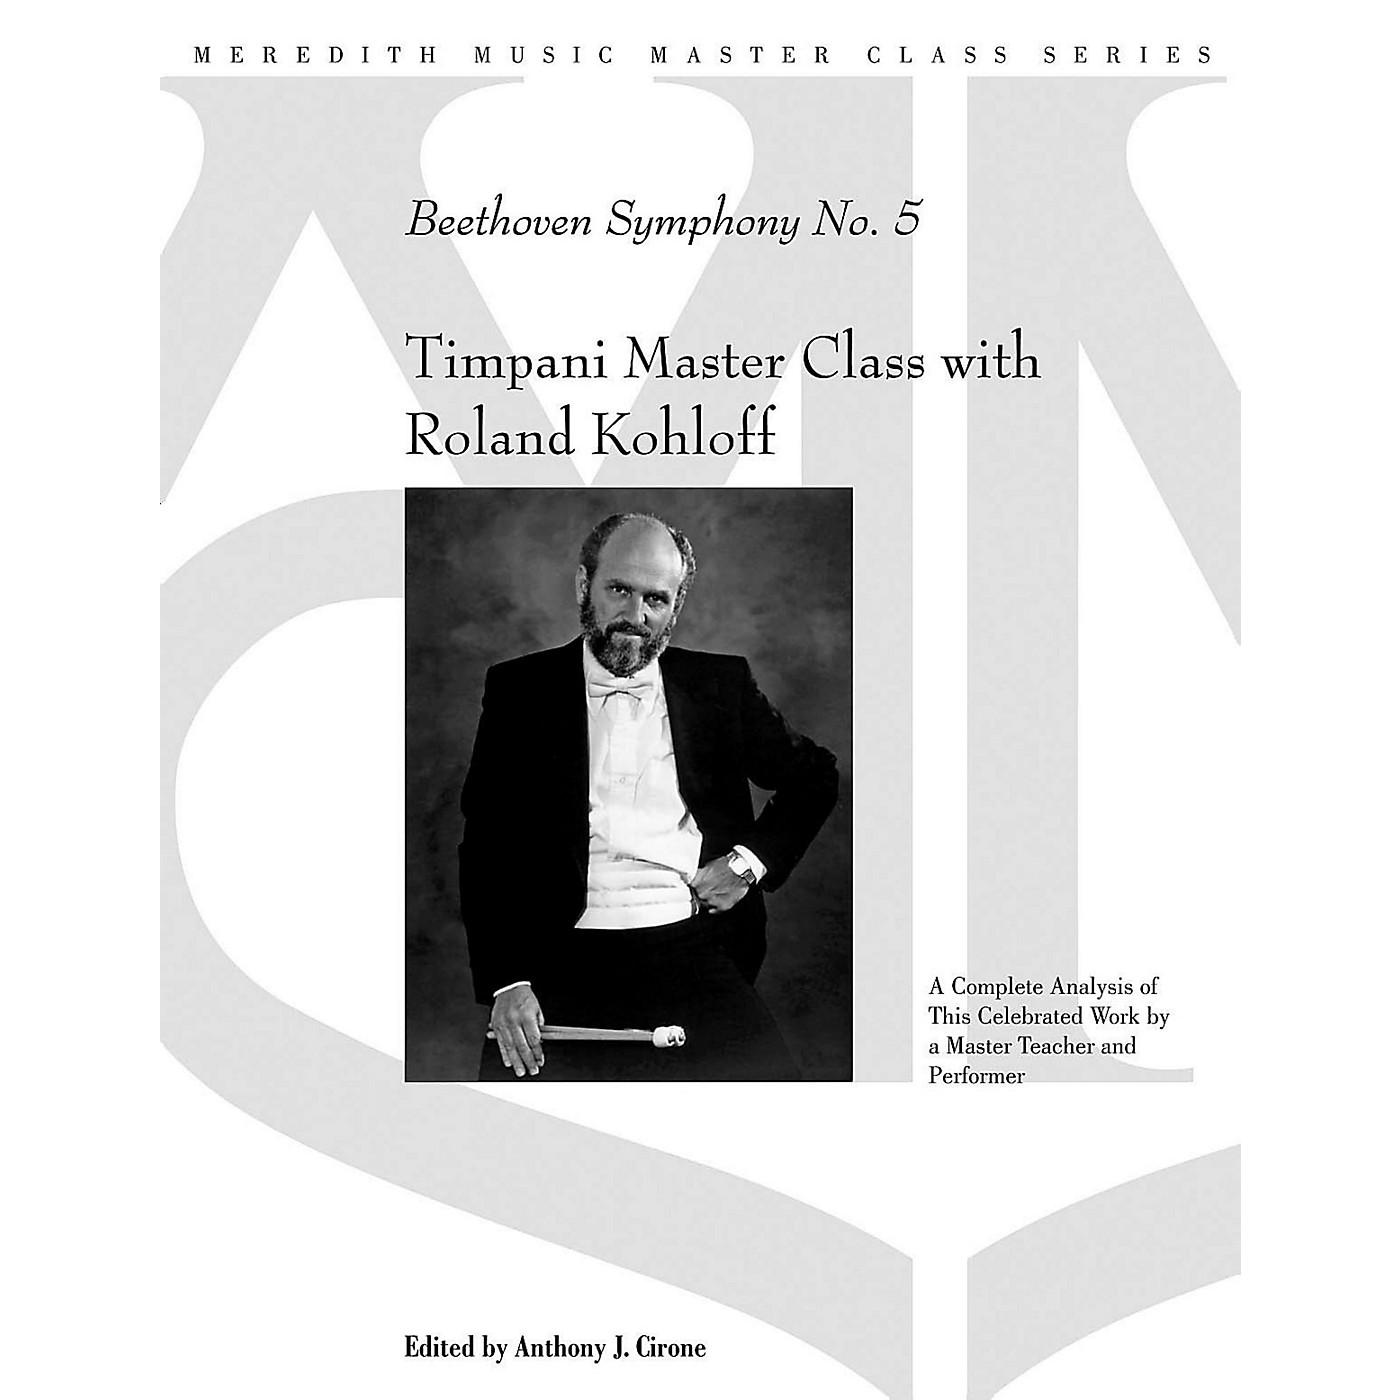 Meredith Music Timpani Master Class With Roland Kohloff - Beethoven Symphony No.5 thumbnail